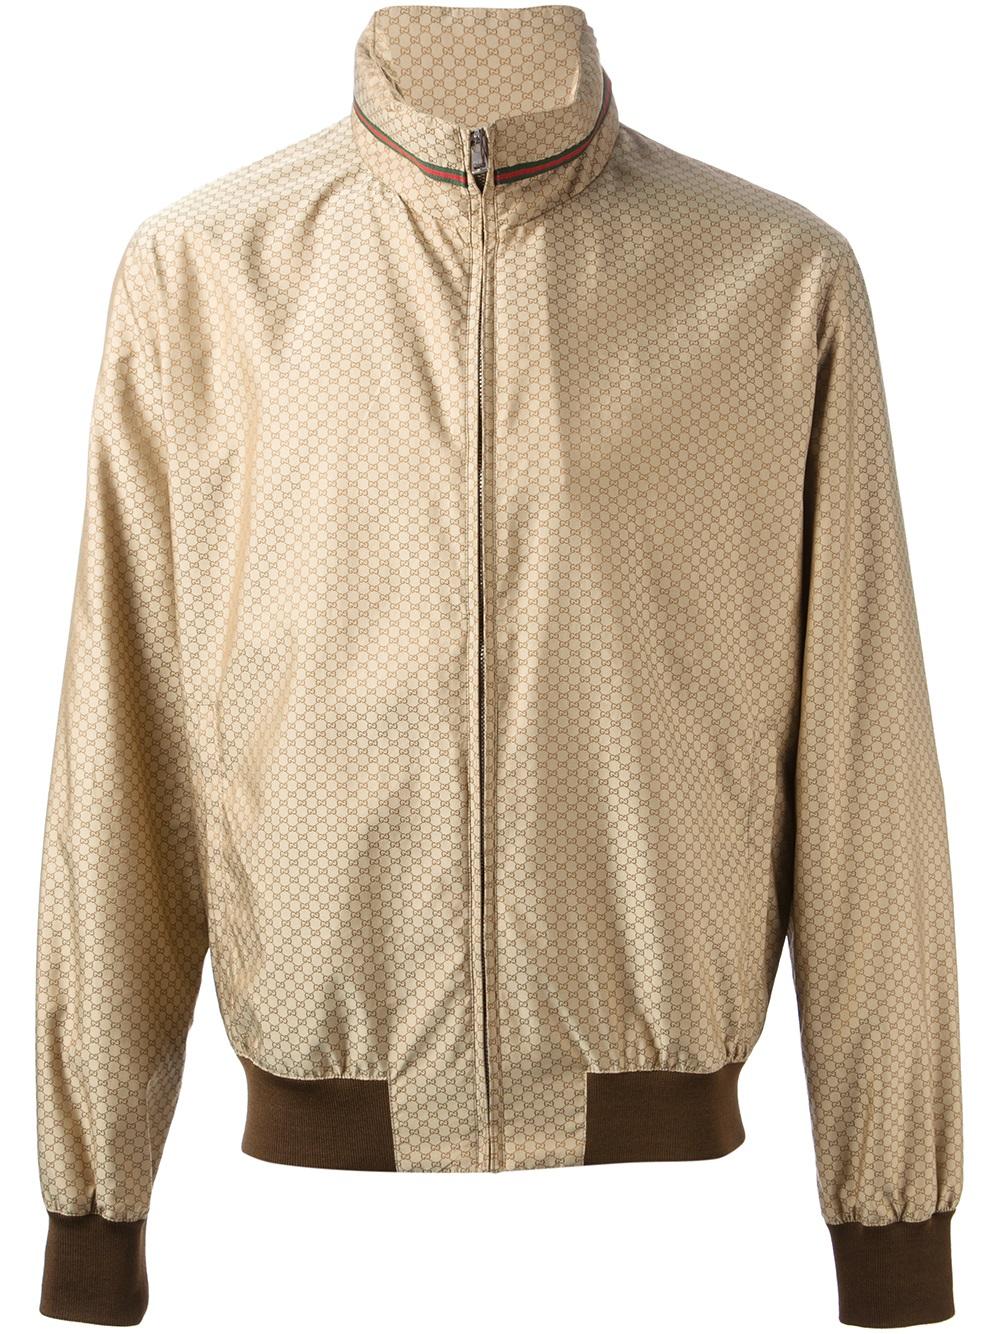 Lyst - Gucci Monogram Bomber Jacket in Brown for Men 661b3ea1219f